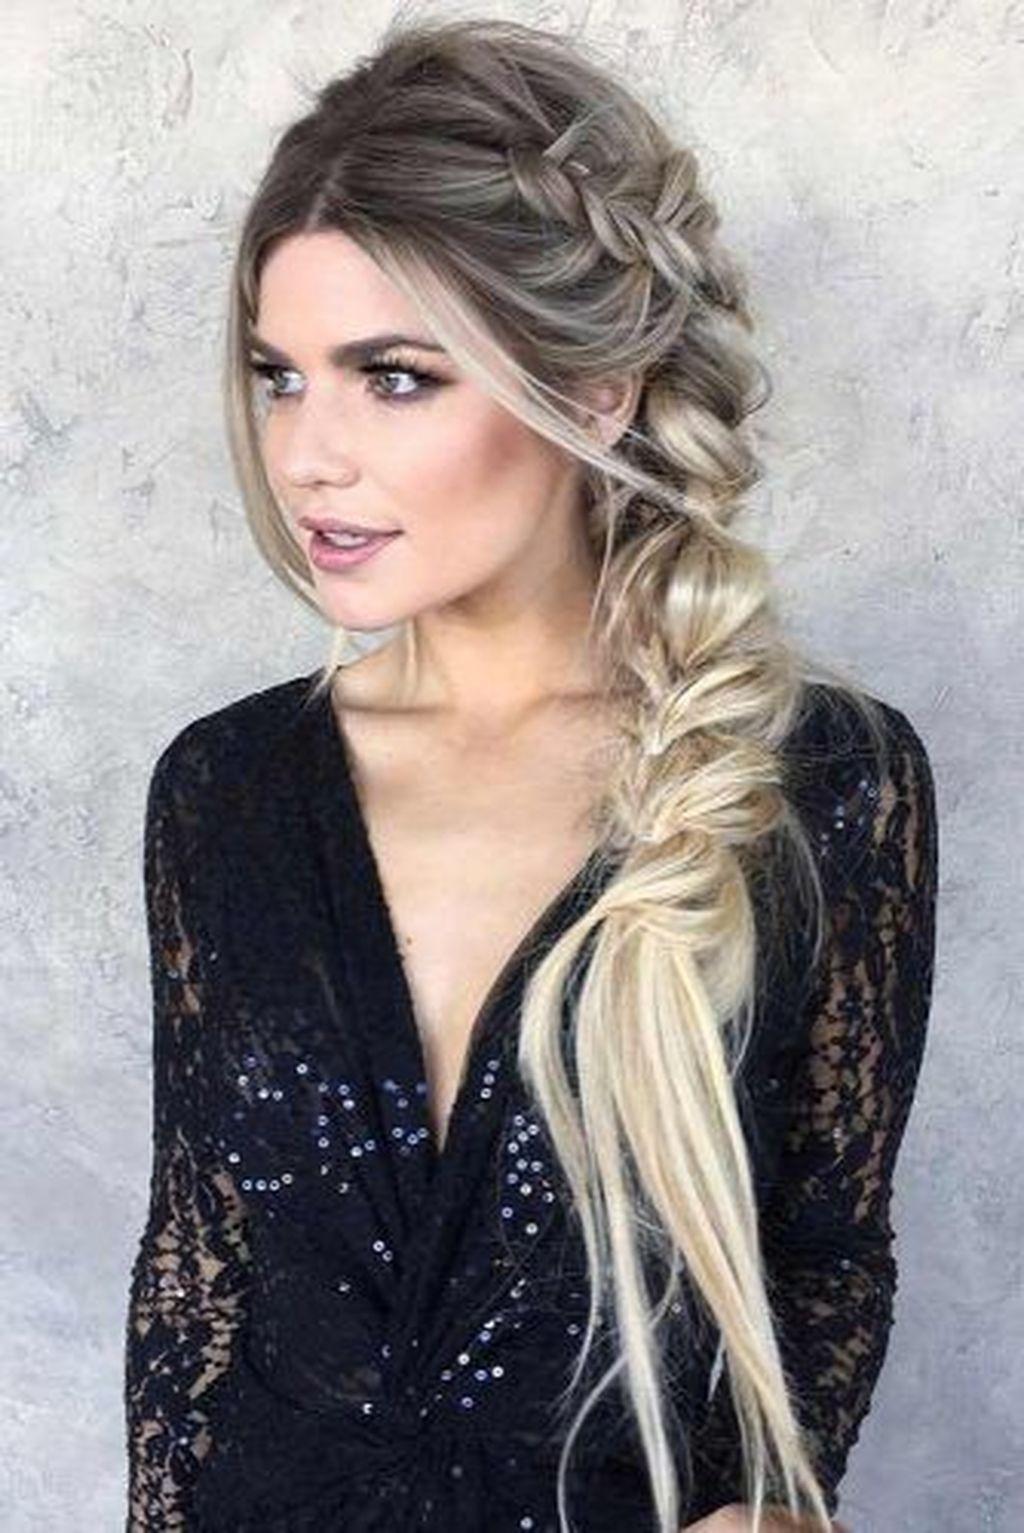 Hair Inspiration 2019-07-02 21:22:50